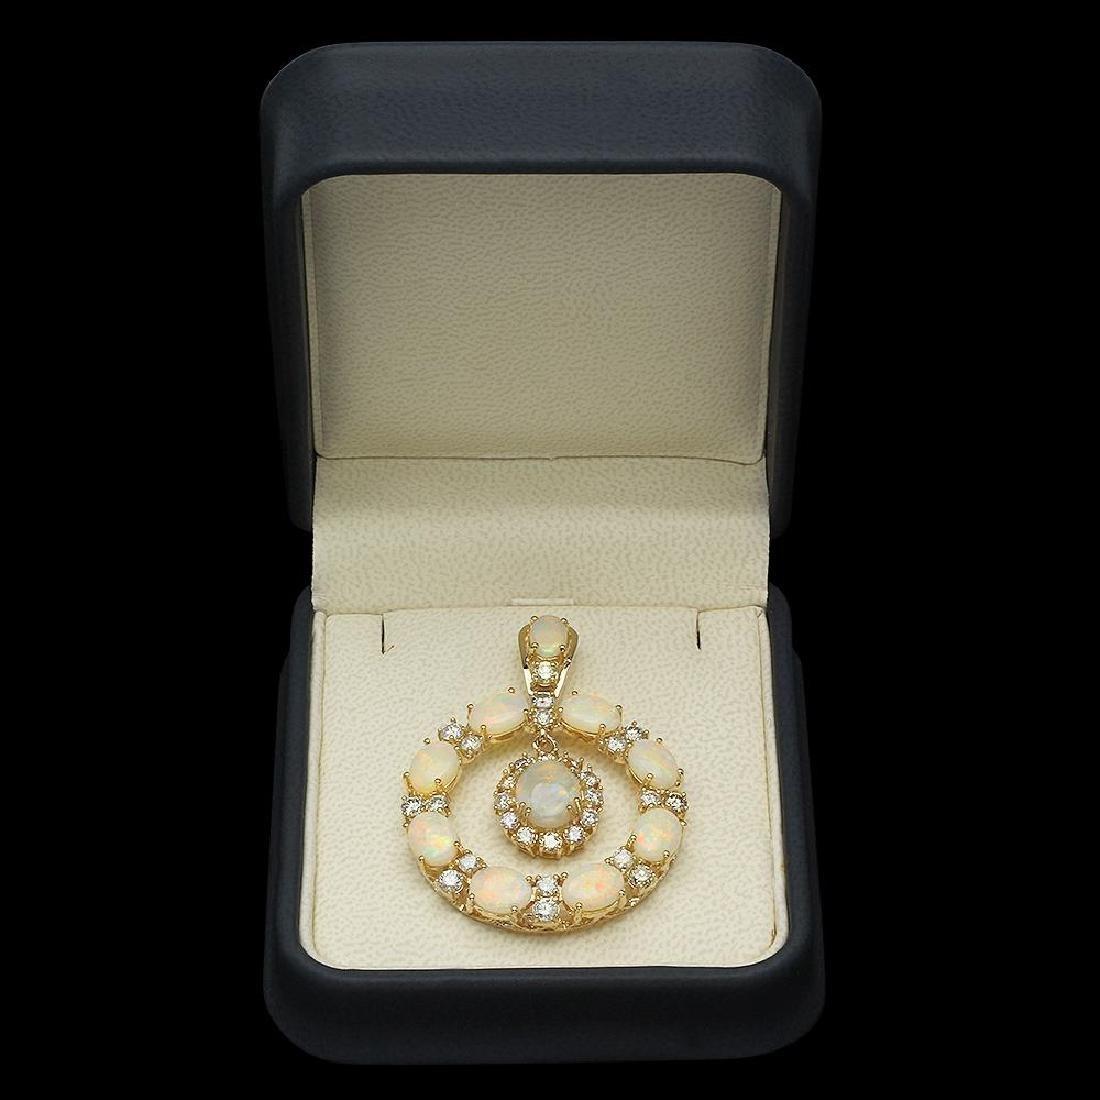 14K Gold 7.43ct Opal 2.42ct Diamond Pendant - 3